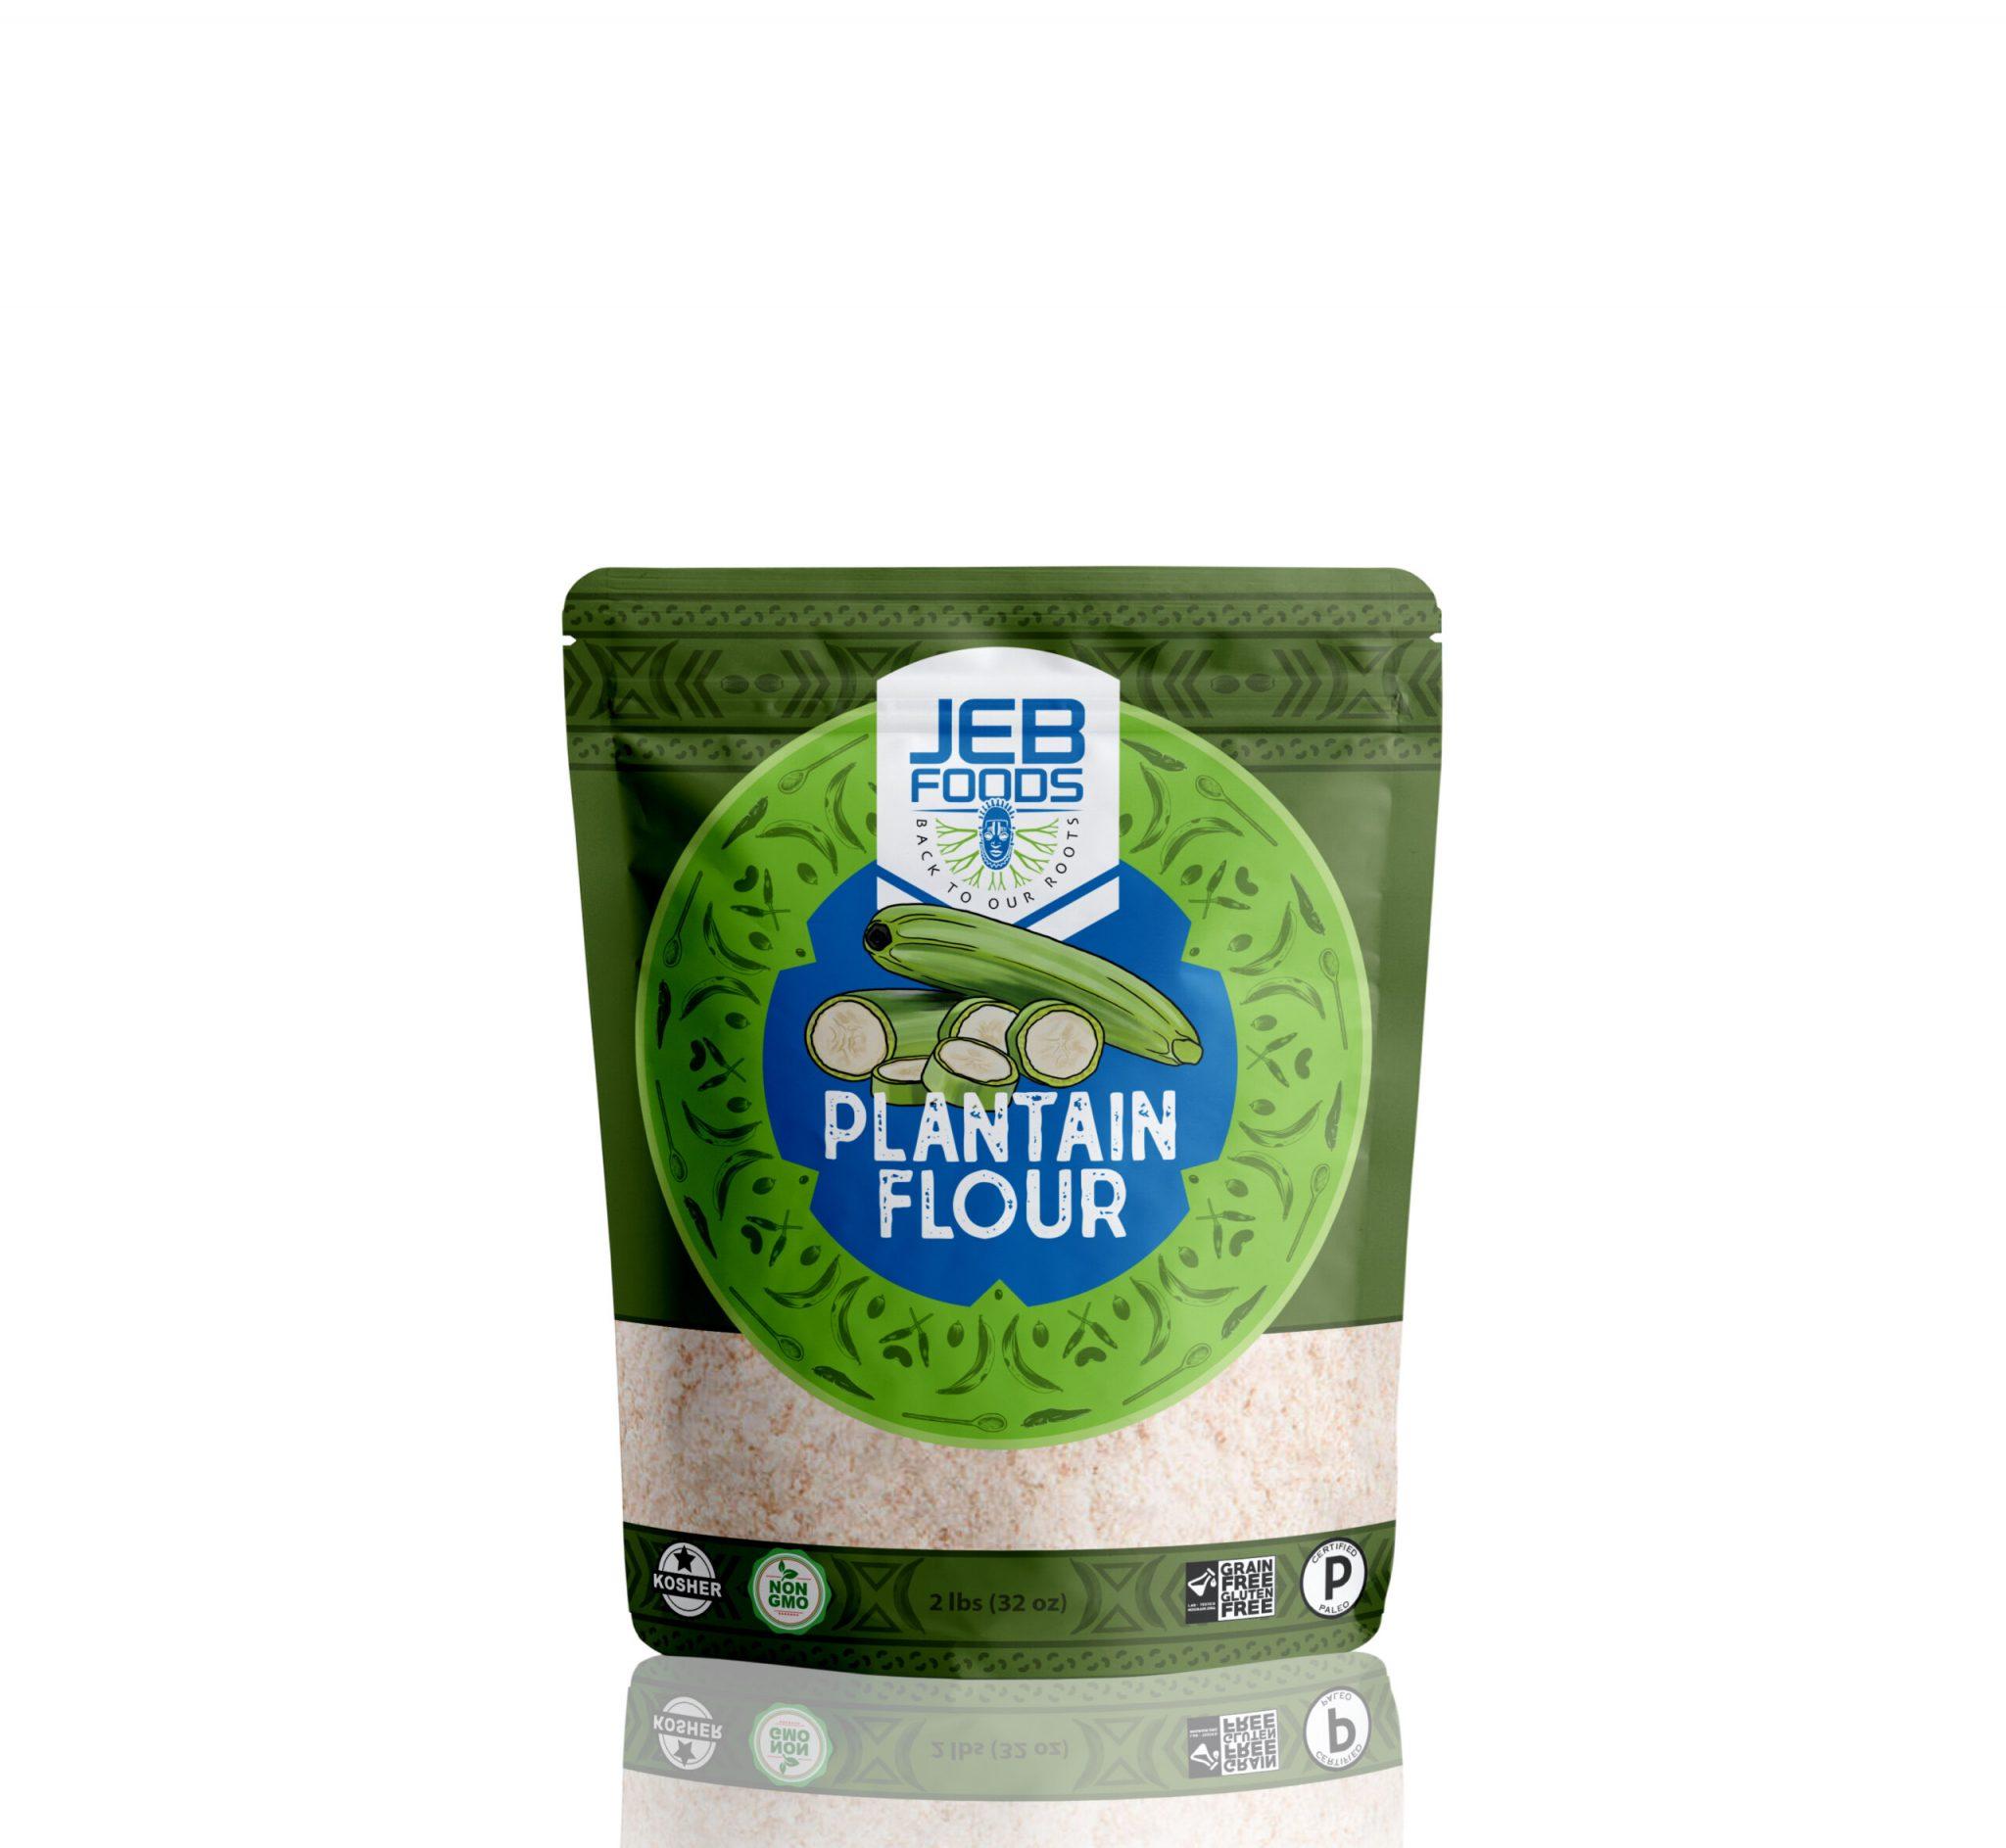 Plantain Flour - Jeb Foods - Grain Free Certified Paleo Keto Certified by the Paleo Foundation